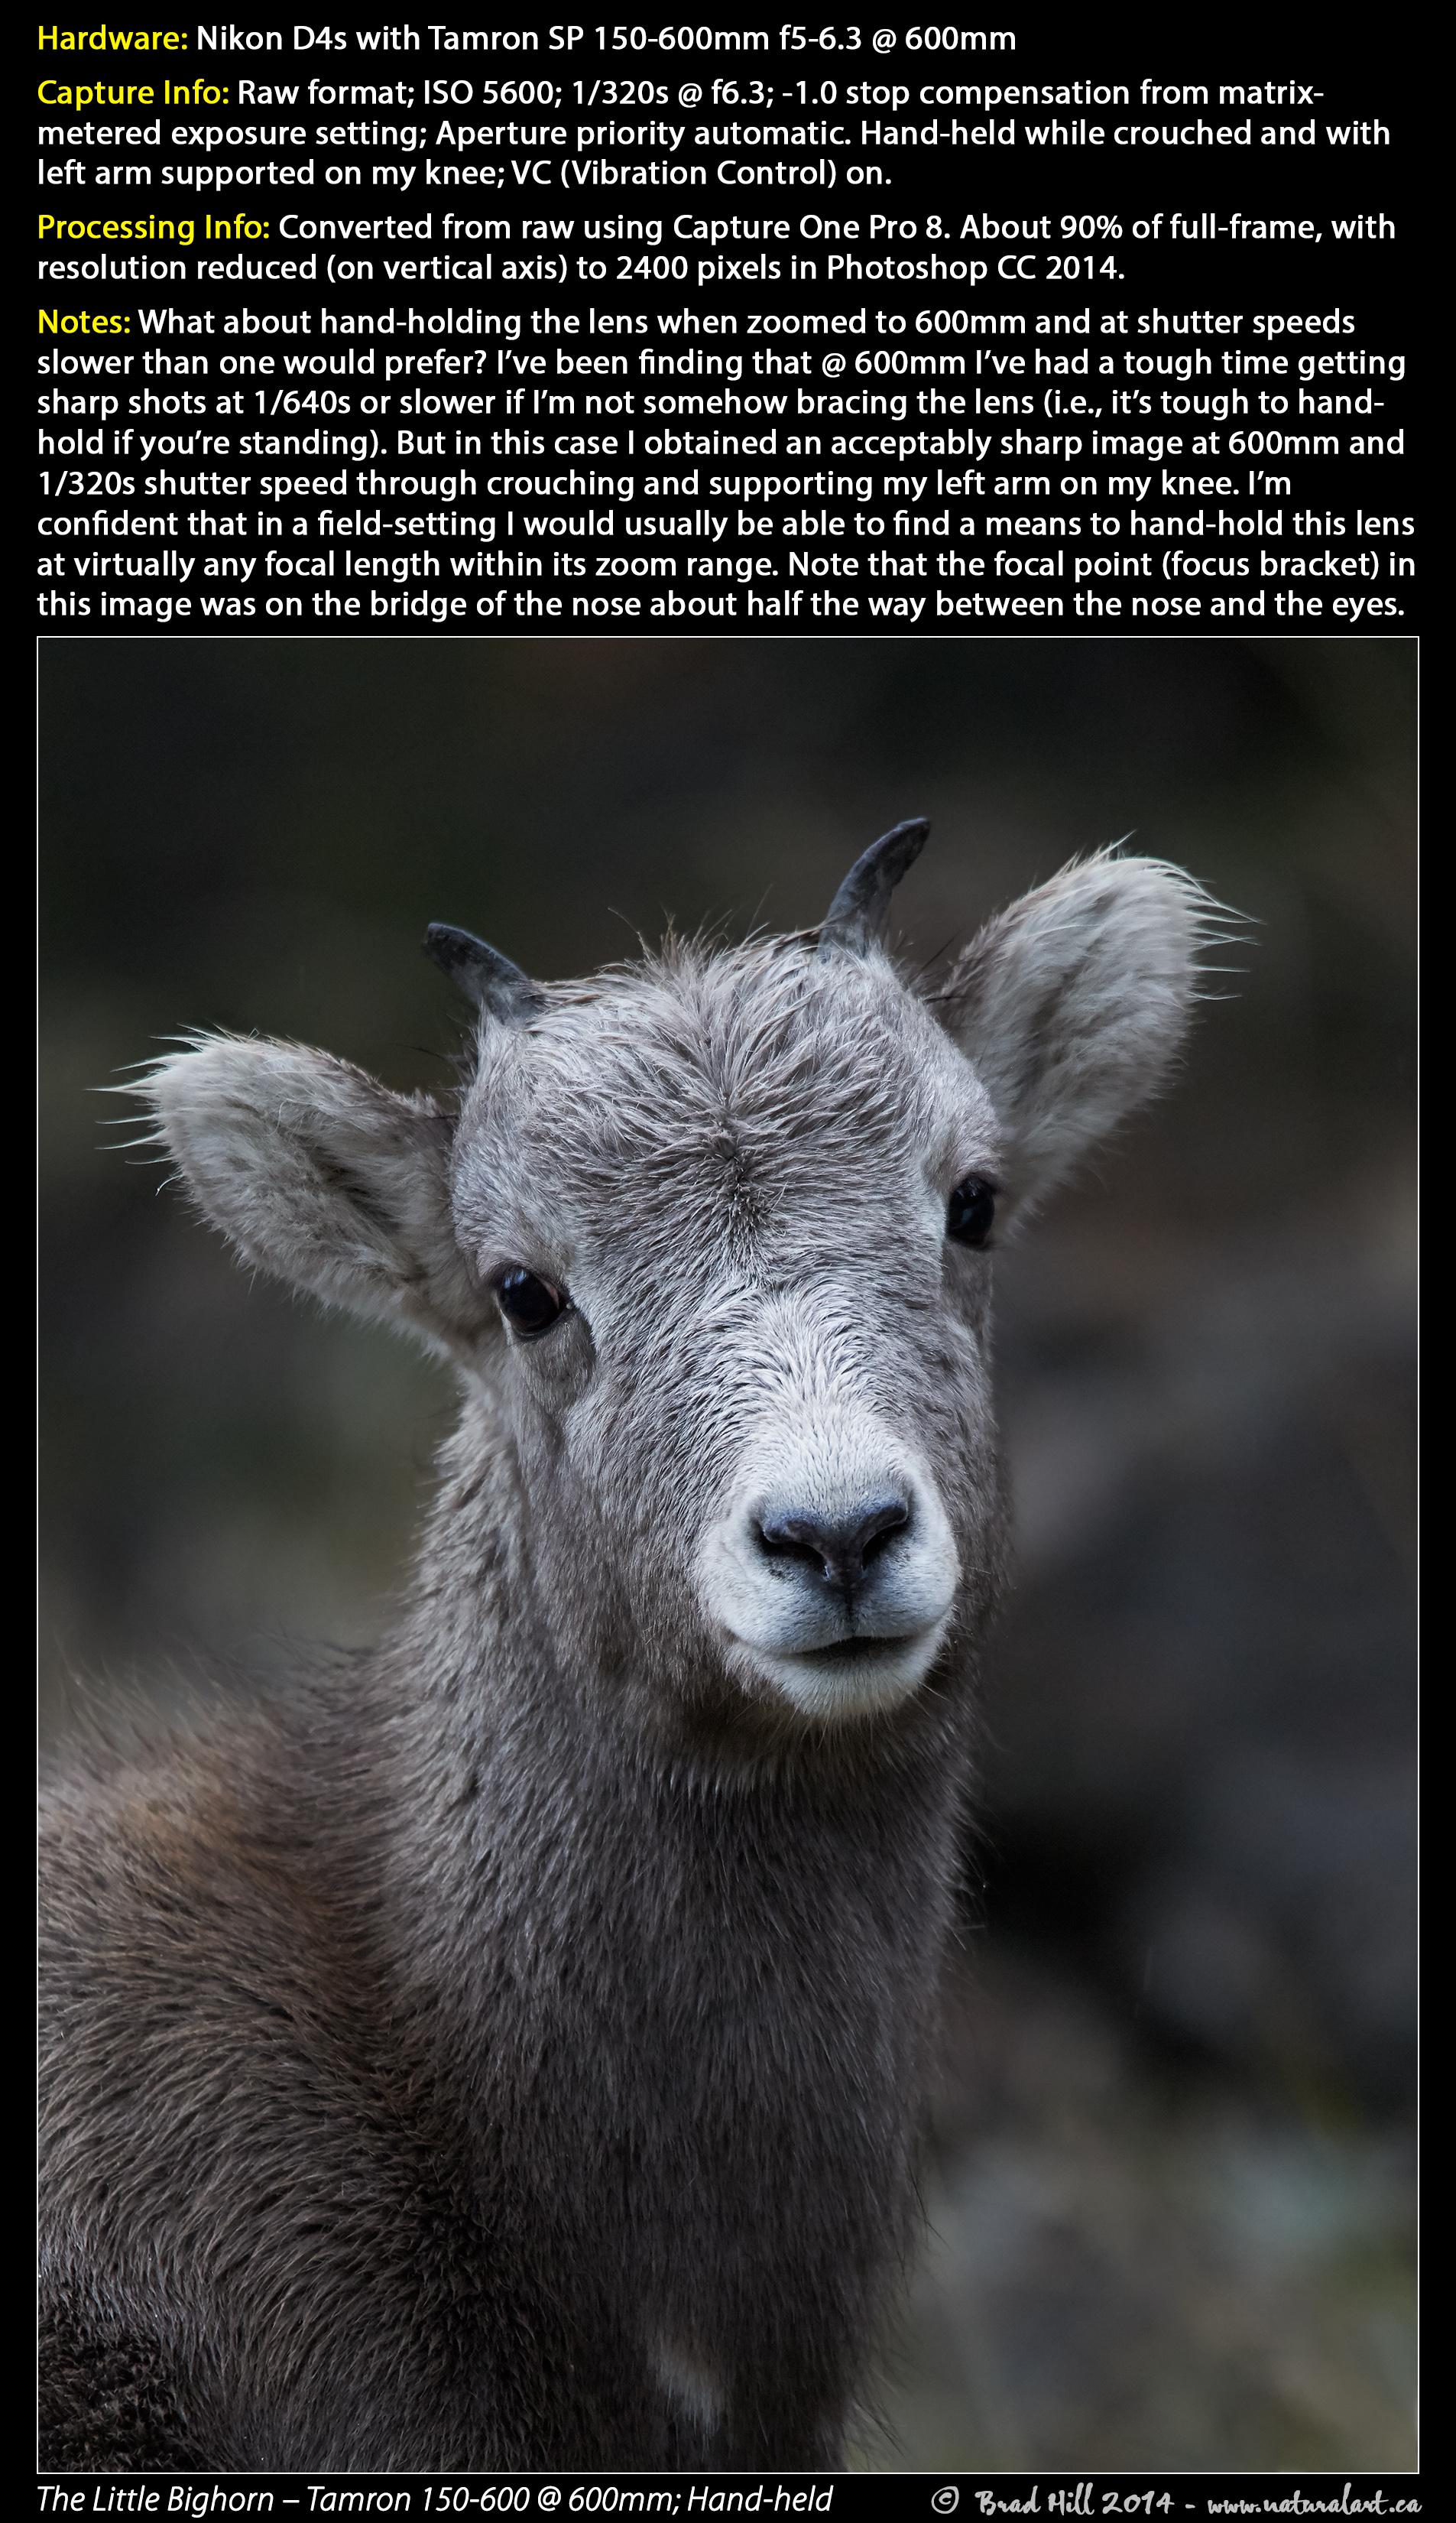 Natural Art Images Voice Brad Hill Blog 2015 Big Horn Satellite Wiring Diagram Bighorn Lamb Tamron 150 600 460mm 1 320s Download 2400 Pixel Image Jpeg 20 Mb The Little 600mm